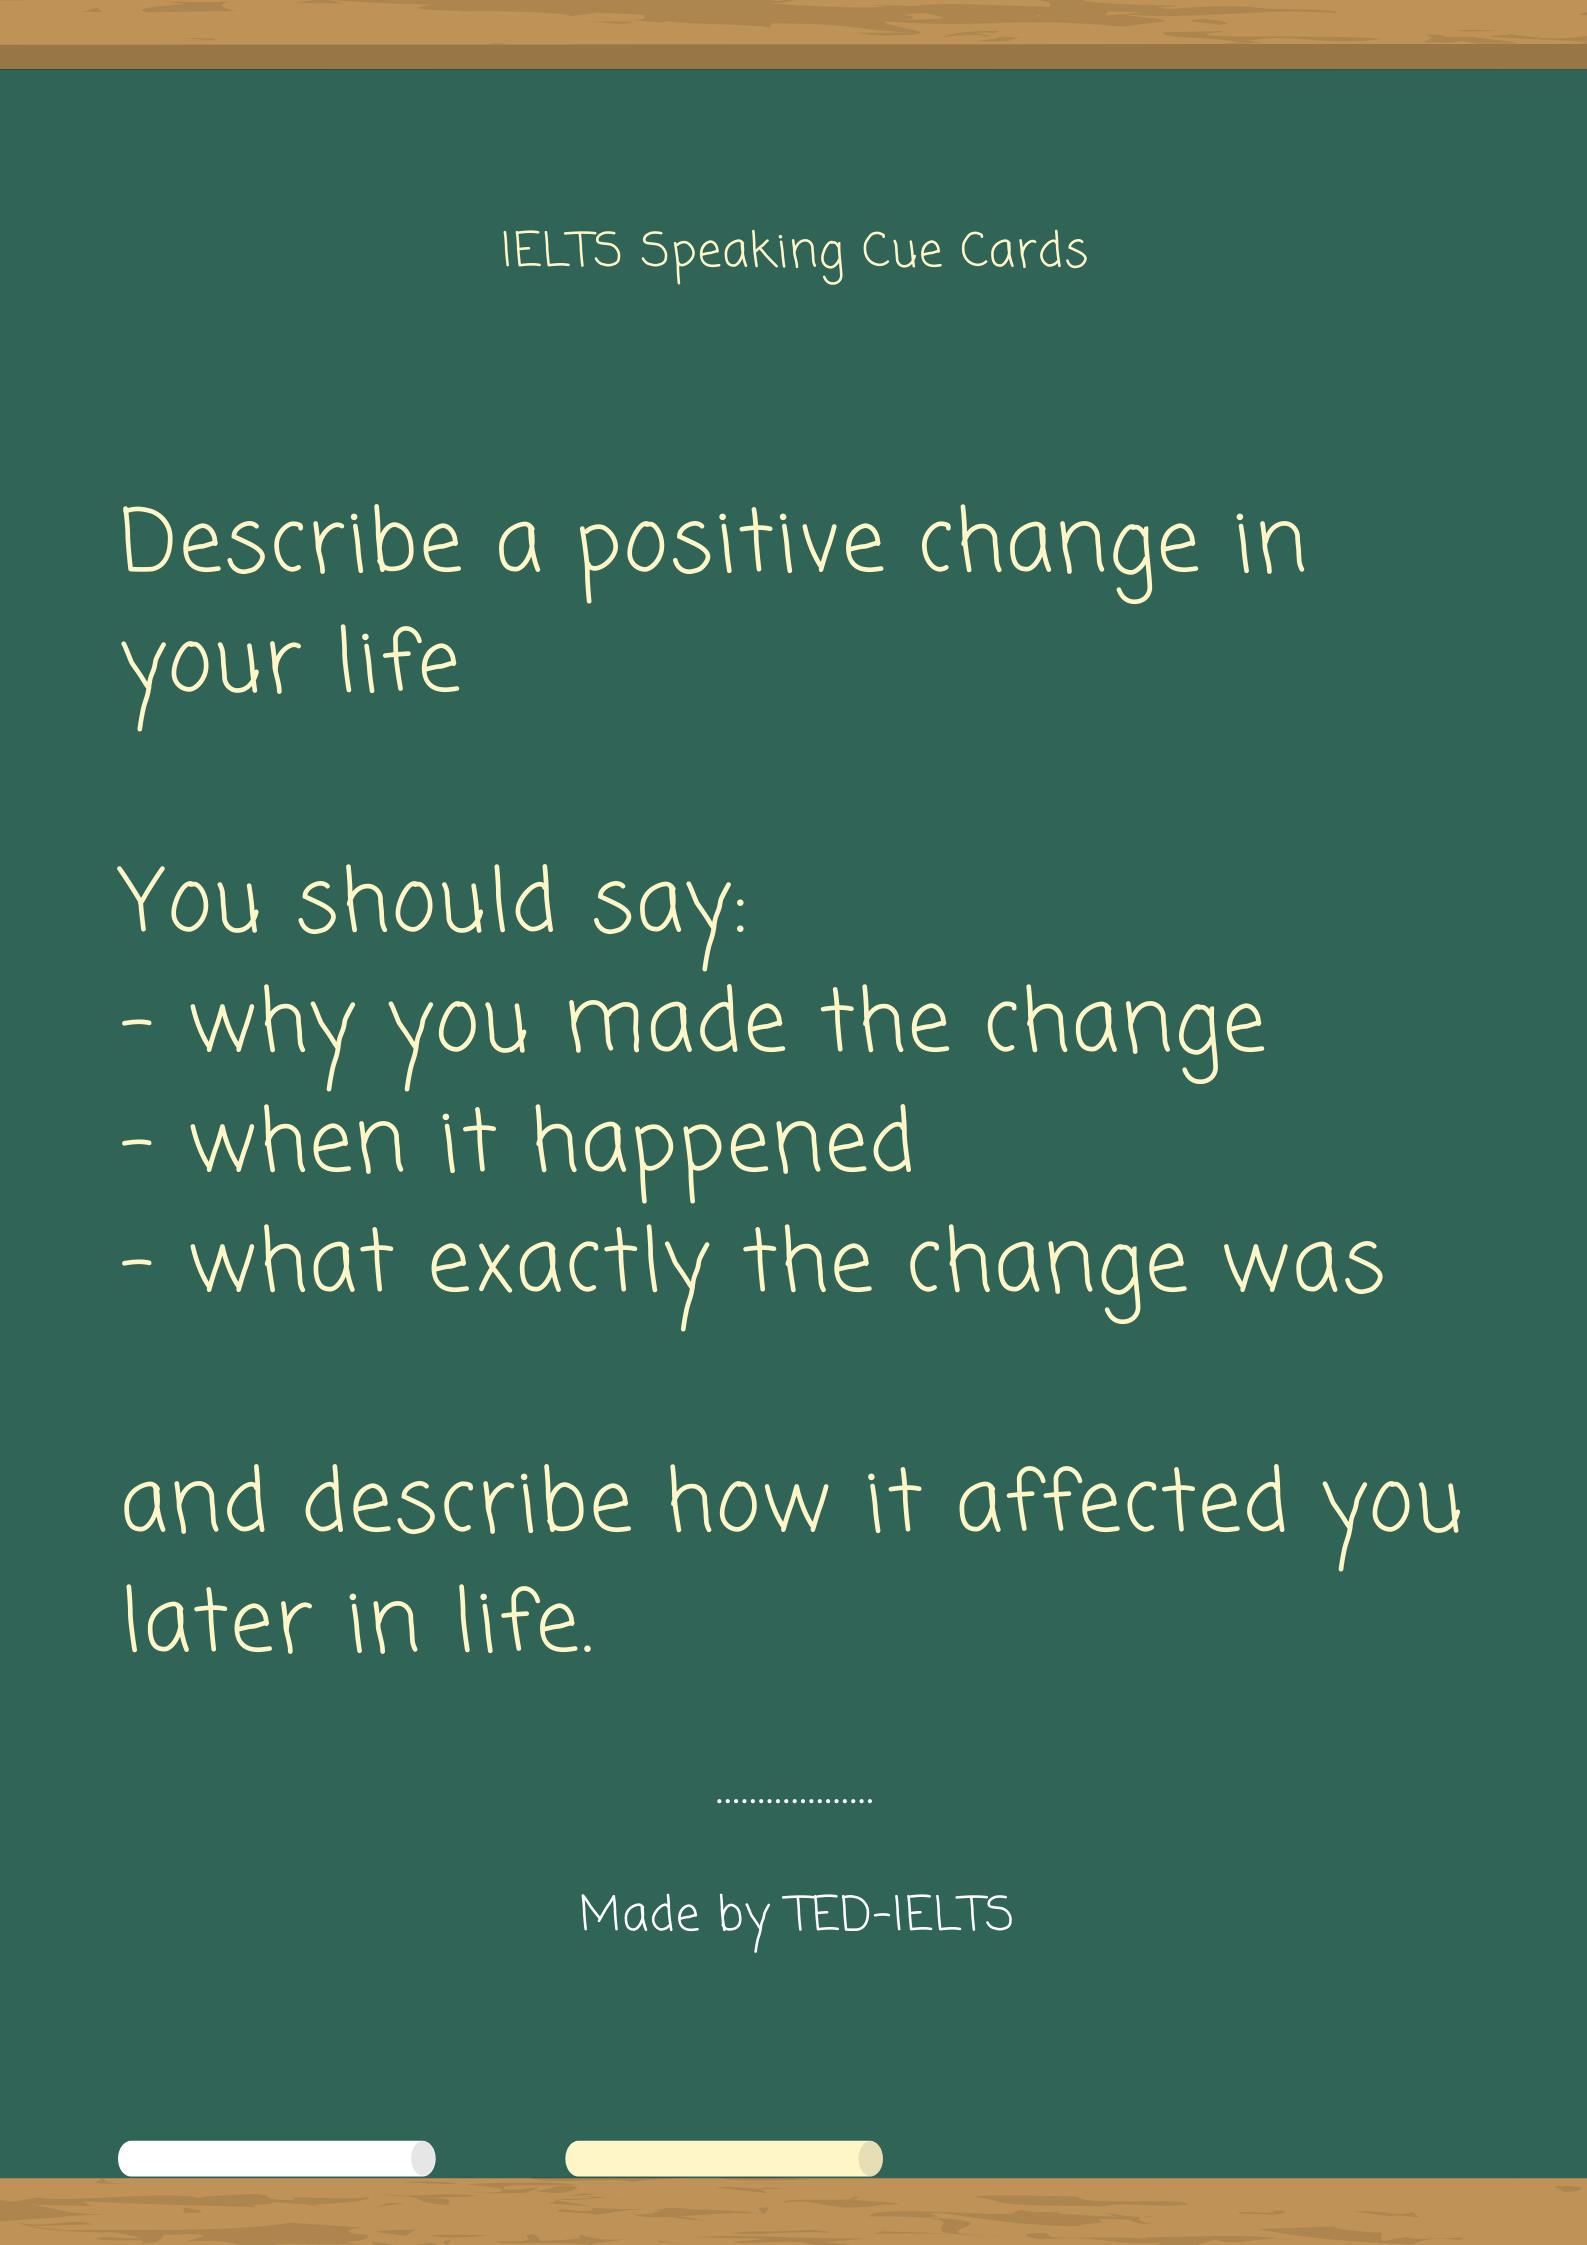 ielts cue card - describe a change